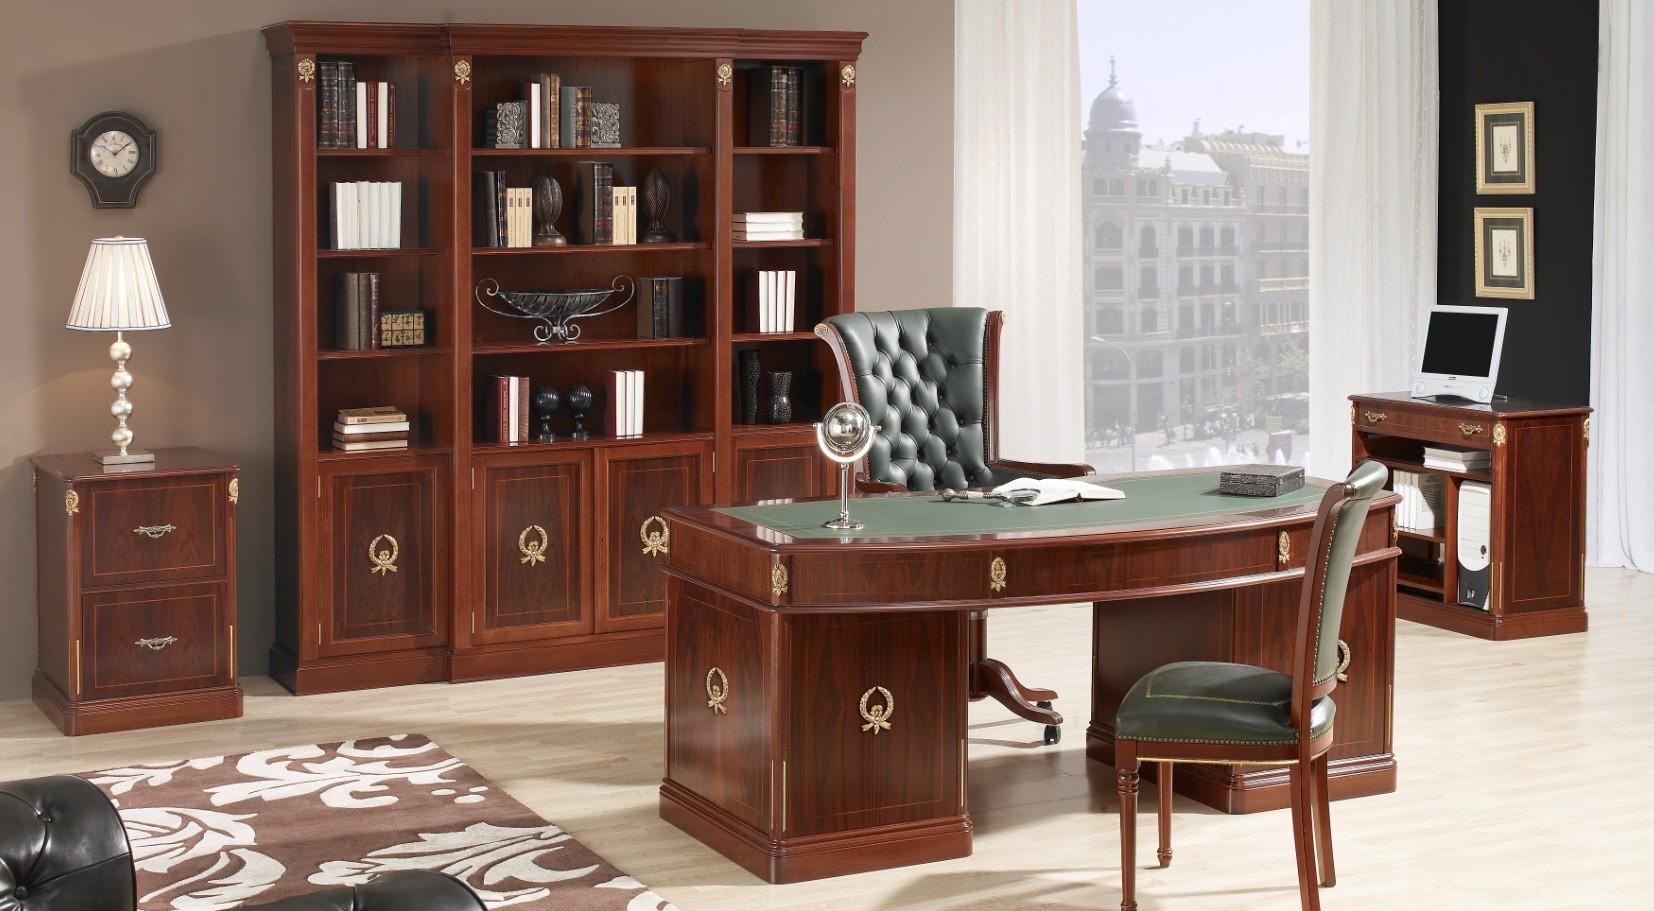 Mesas de despacho cl sicas espacios de trabajo acogedores - Mesas de salon clasicas ...